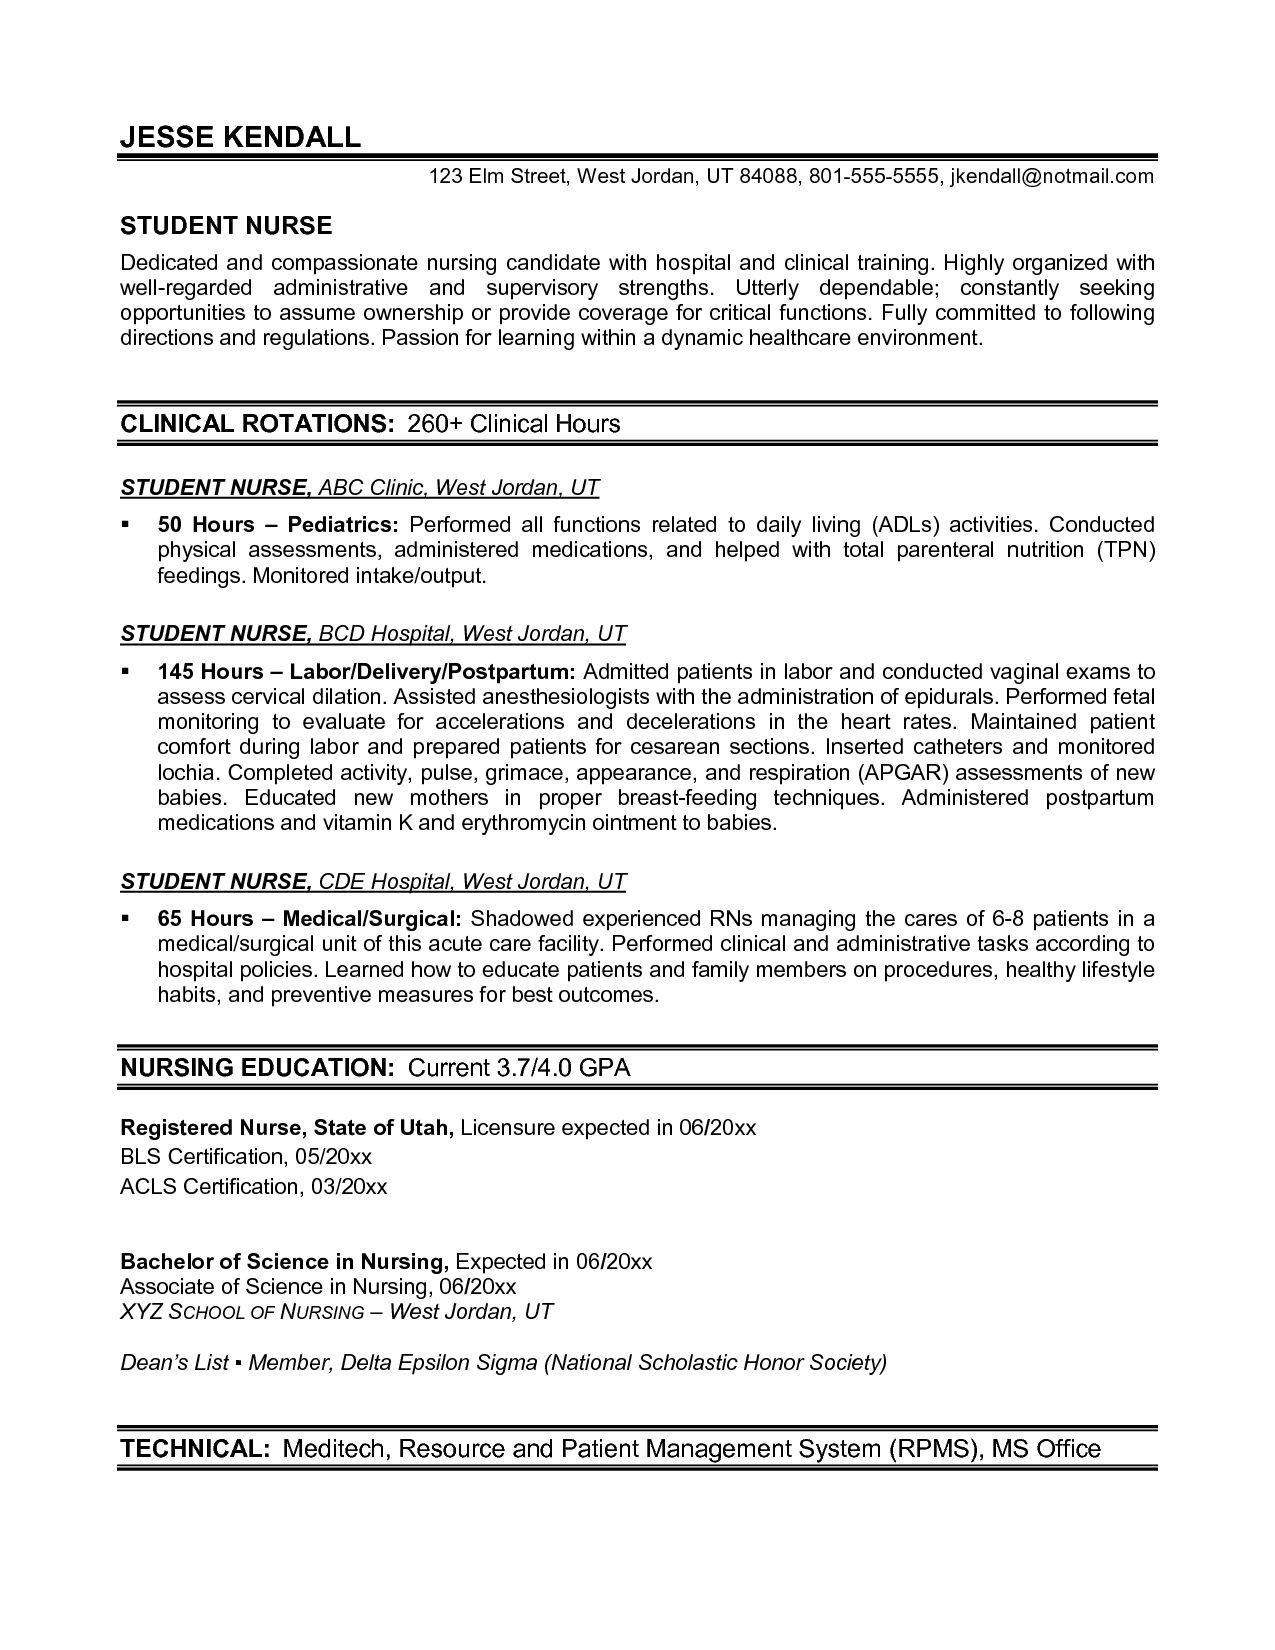 New Grad Resume Labor And Delivery Rn